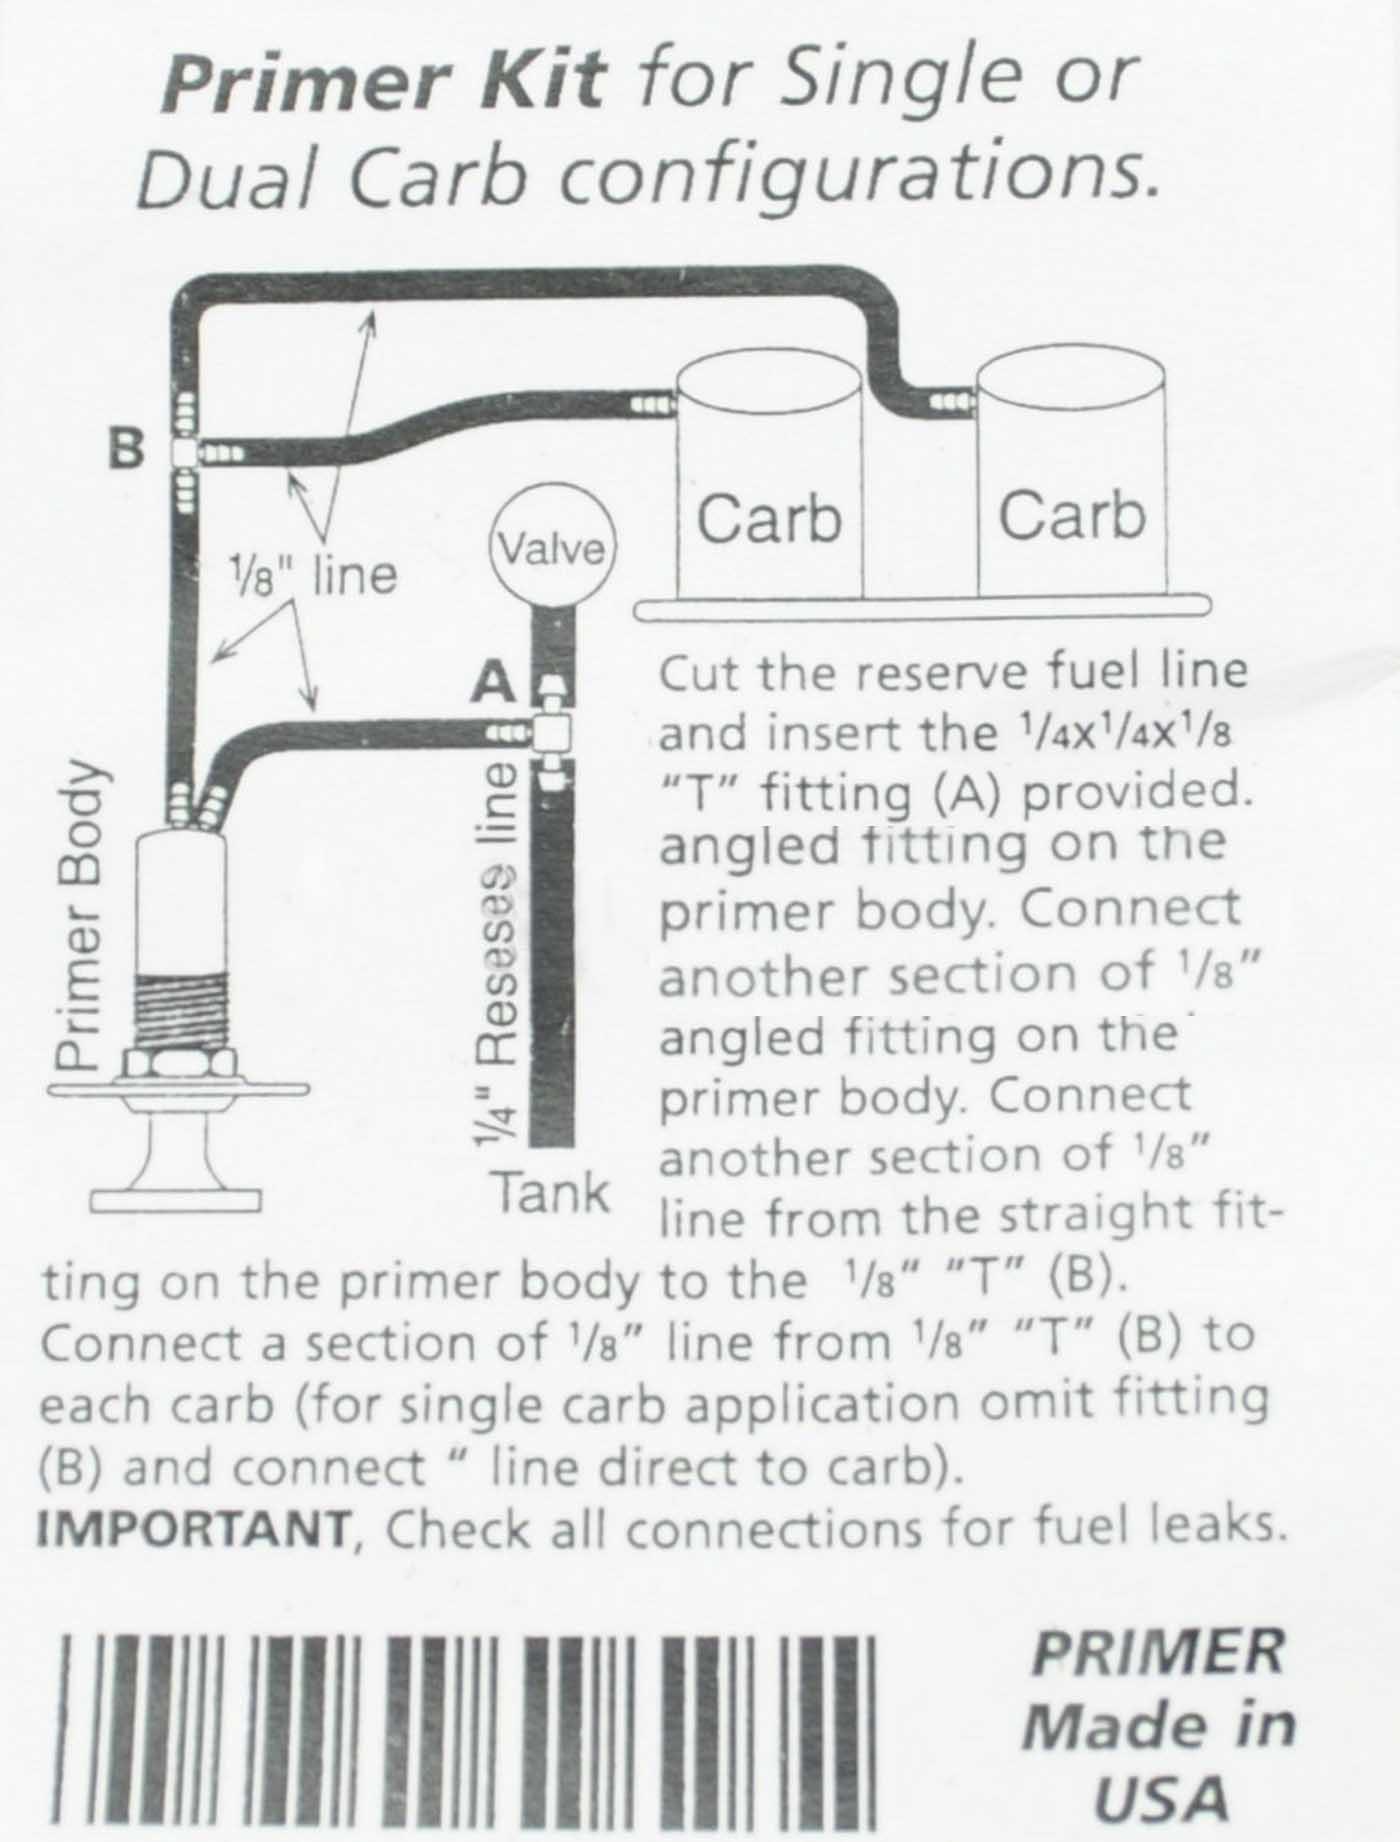 Mikuni Bst36 carb Manual Installation instructions